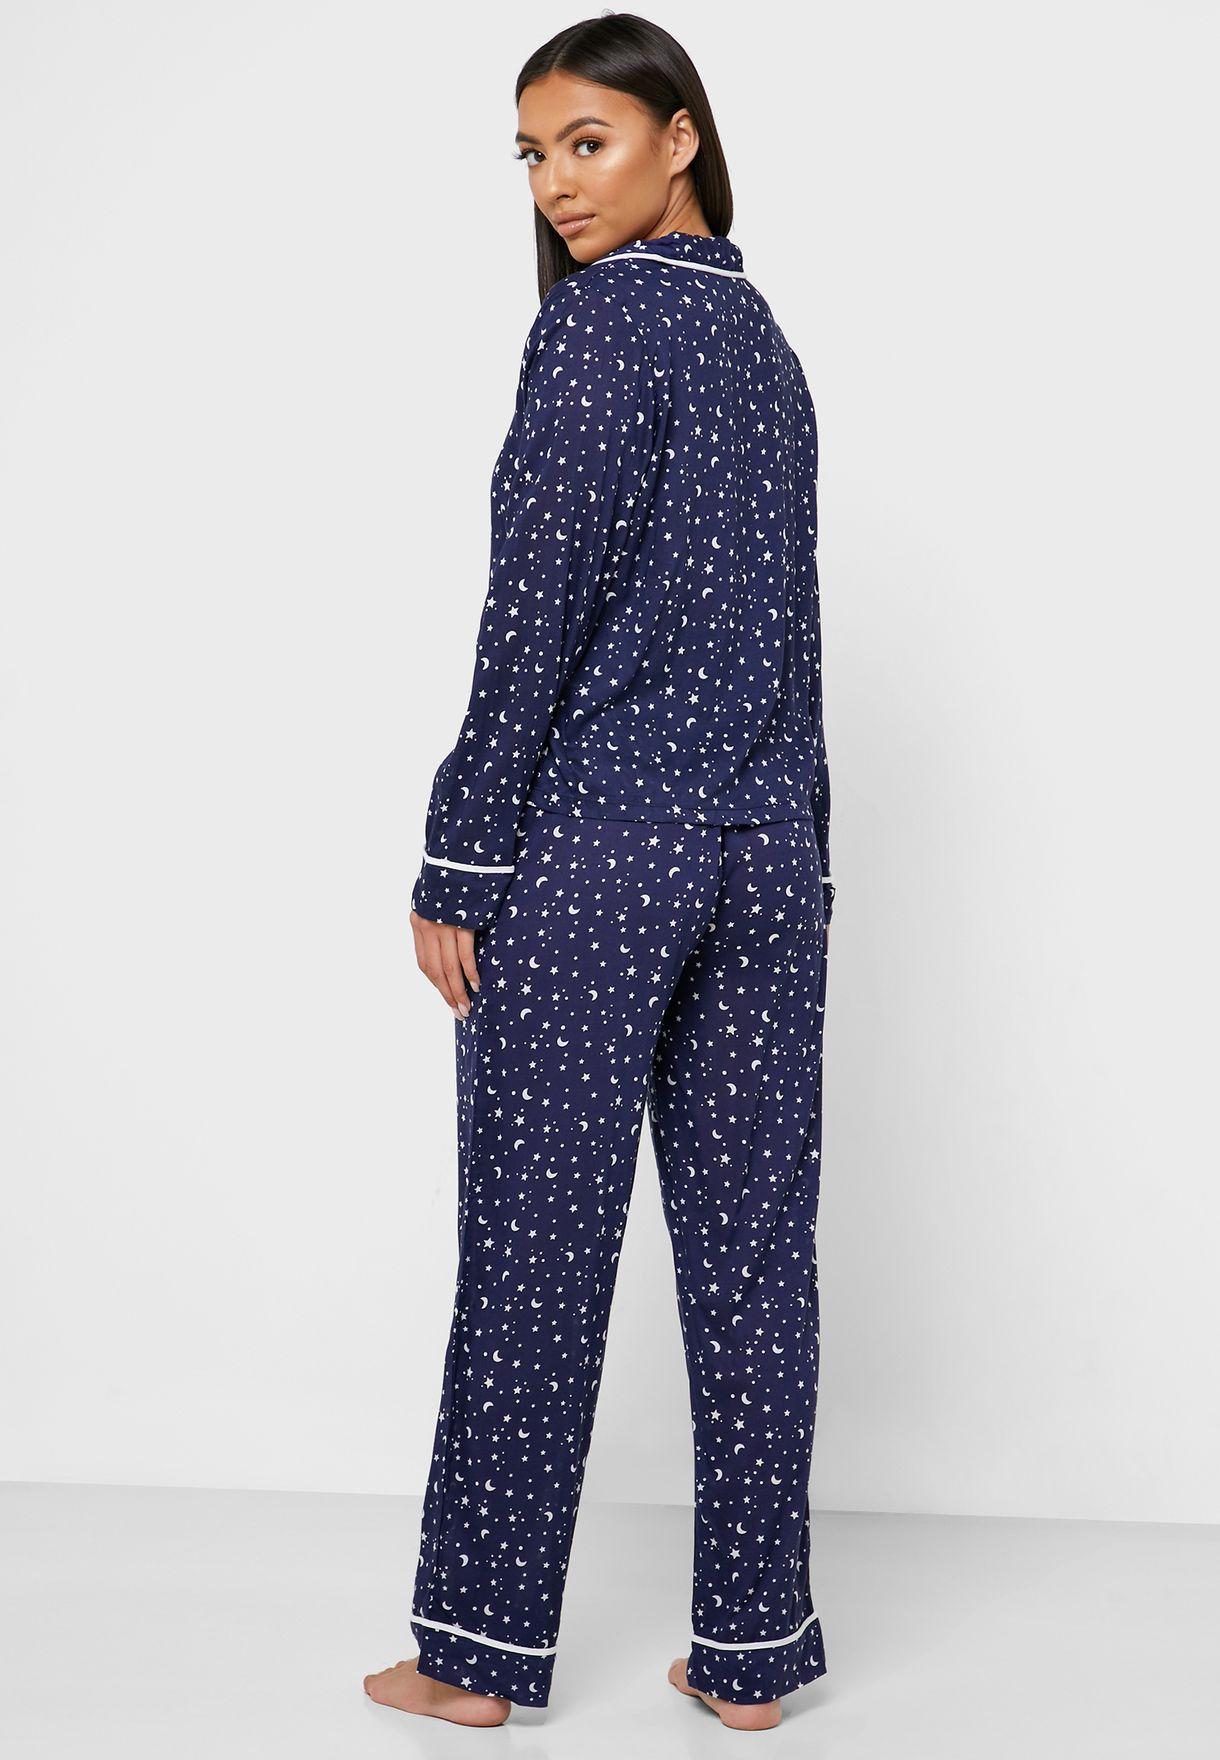 Star Print Piping Shirt & Pyjama Set